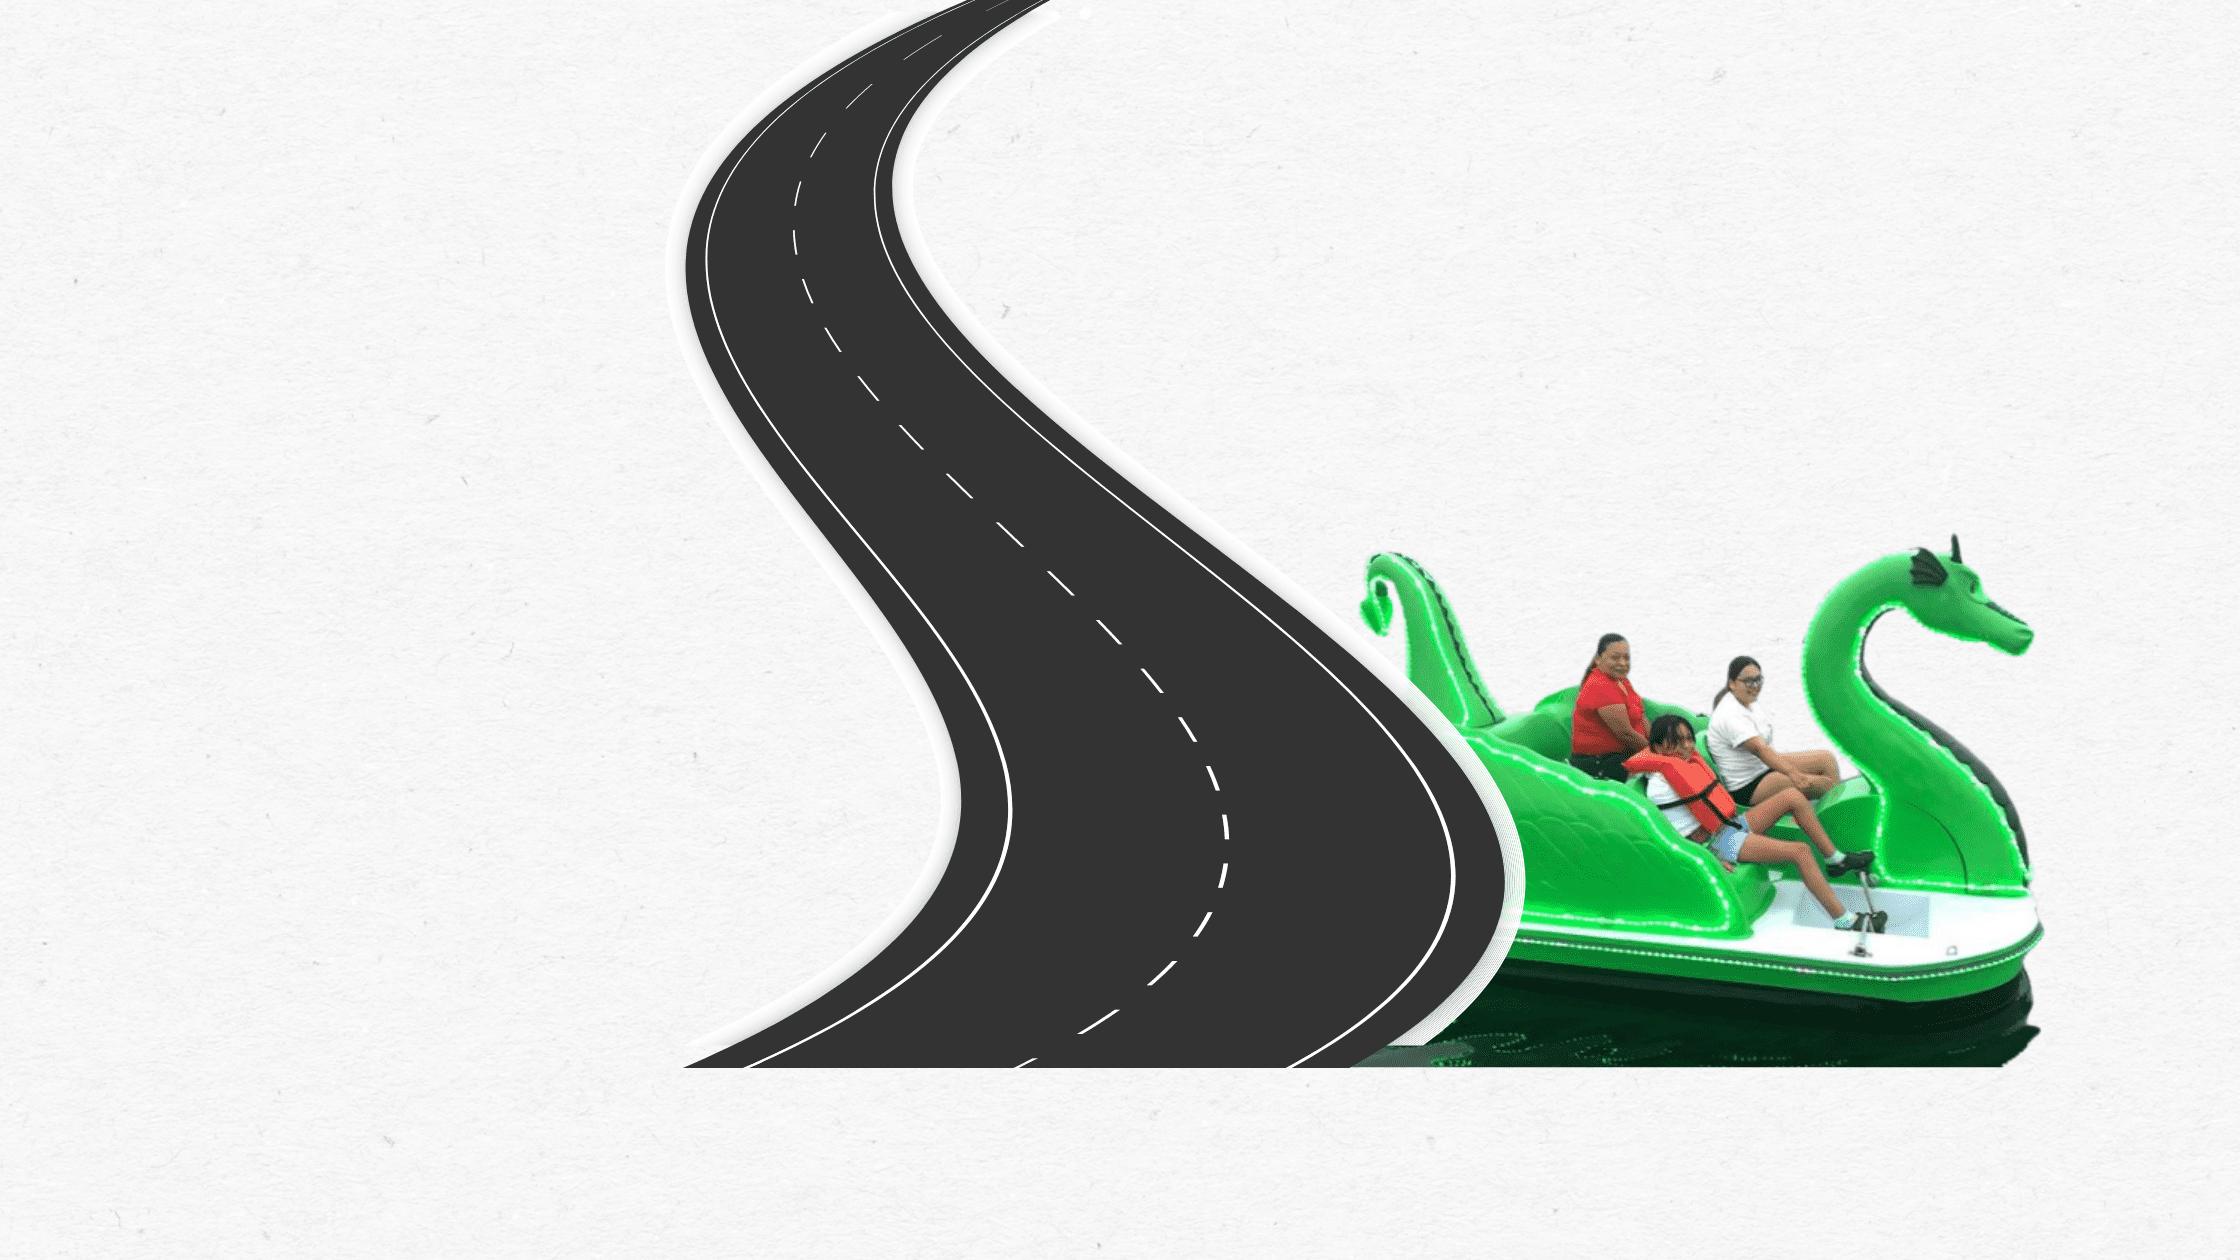 Green dragon pedal boat